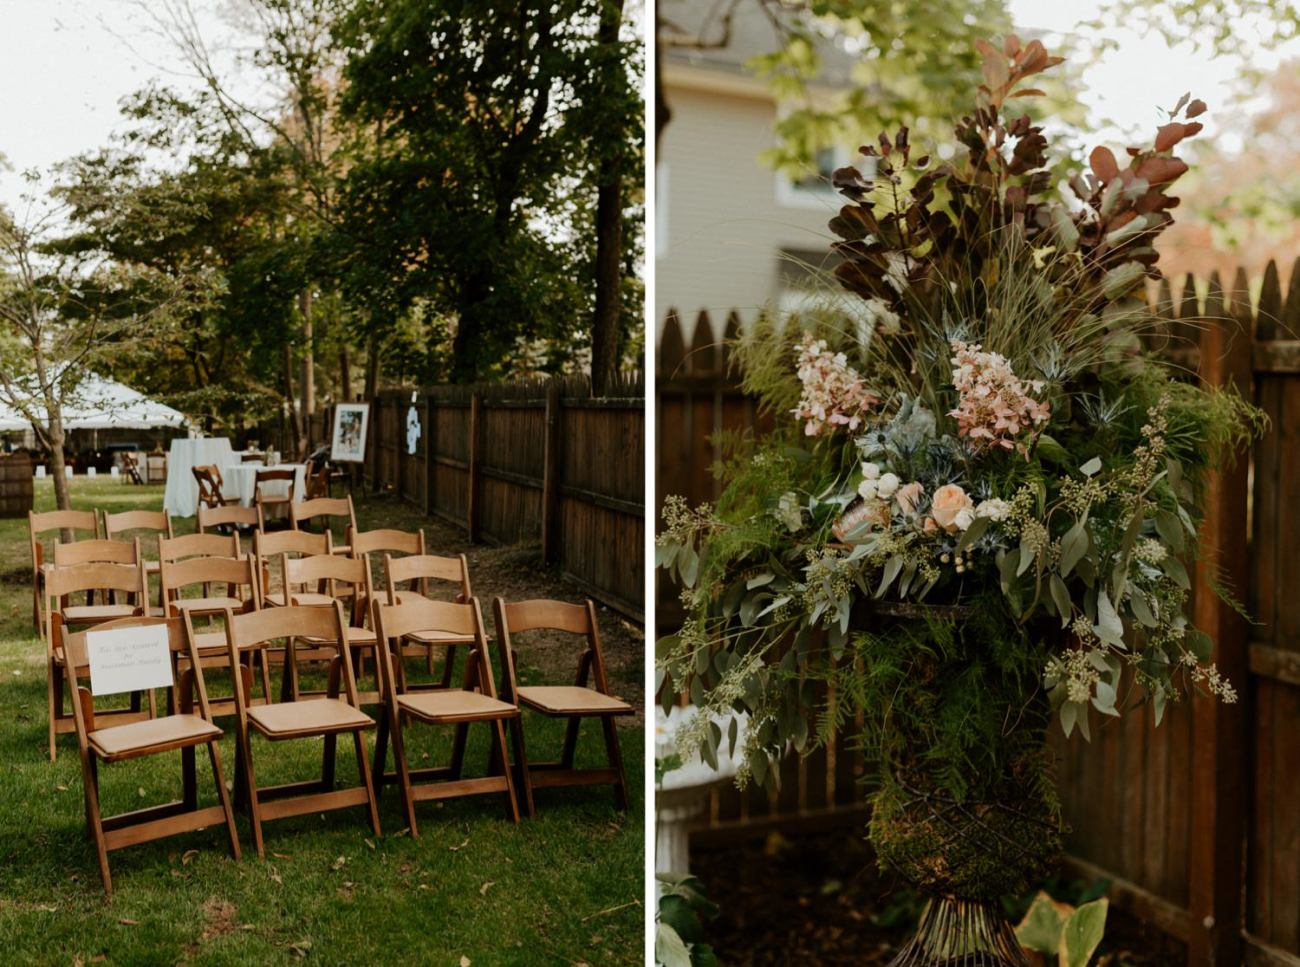 New Jersey Fall Backyard Wedding Bend Wedding Photographer NJ Wedding Photographer Anais Possamai Photography 038